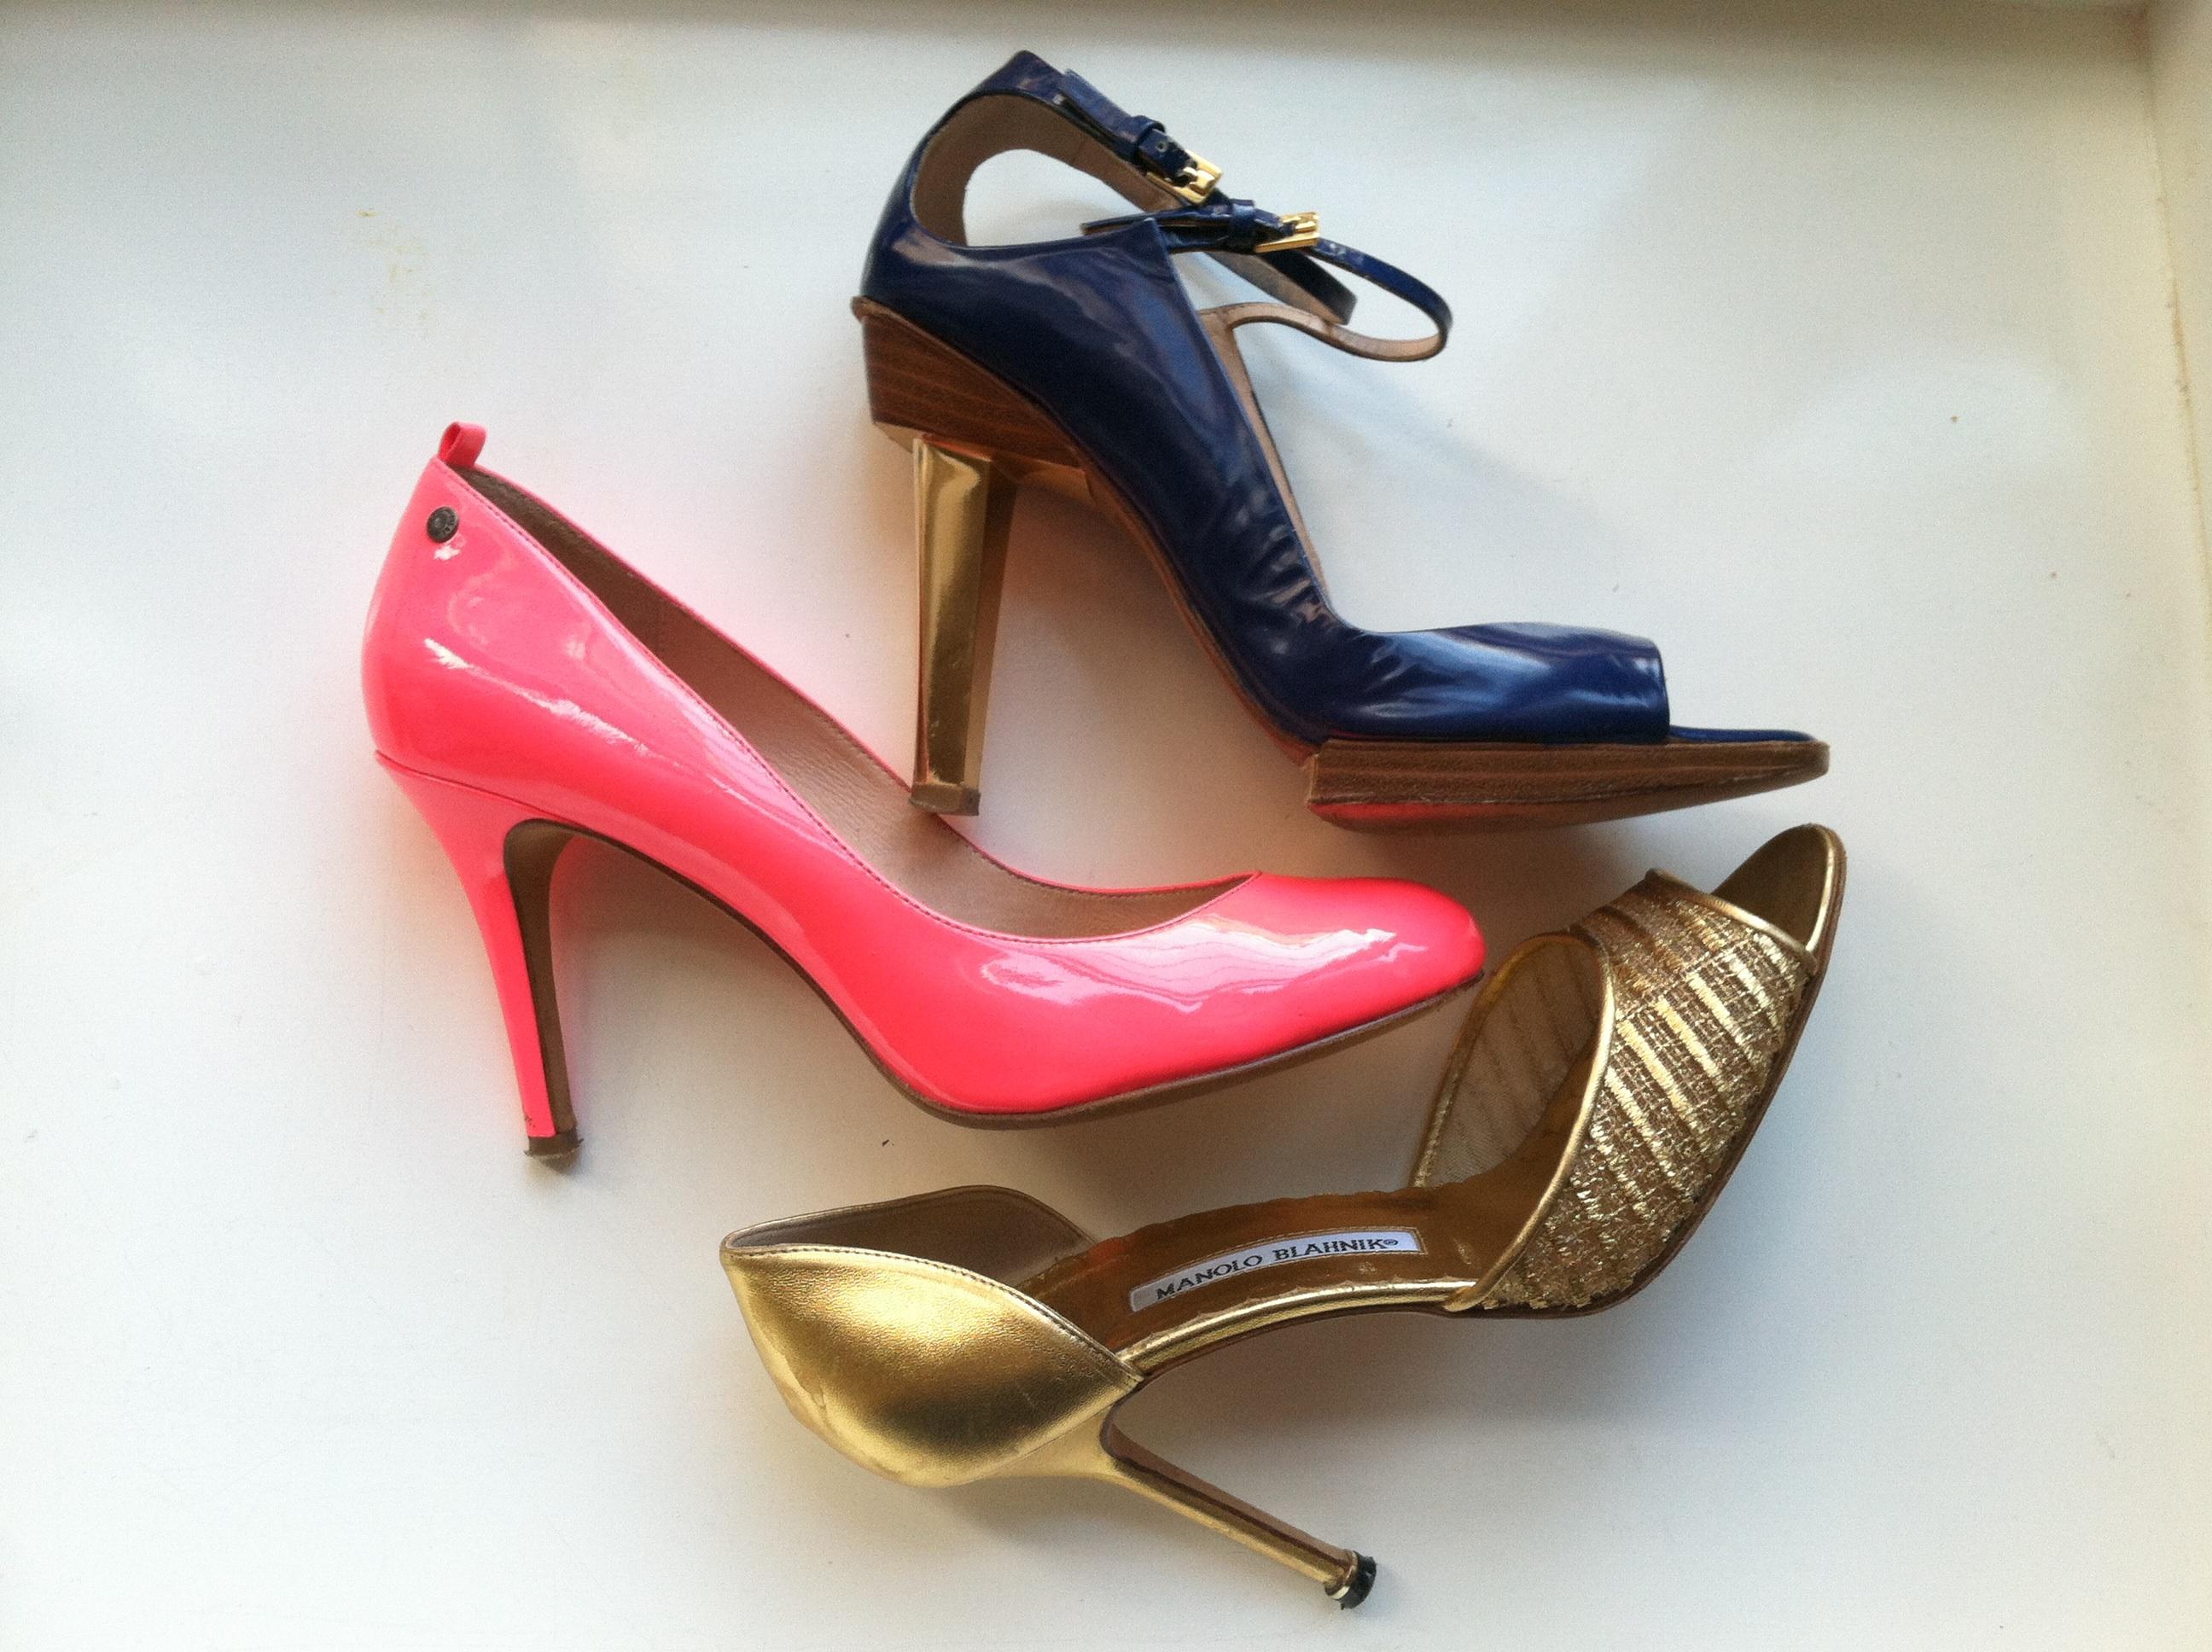 heels pic